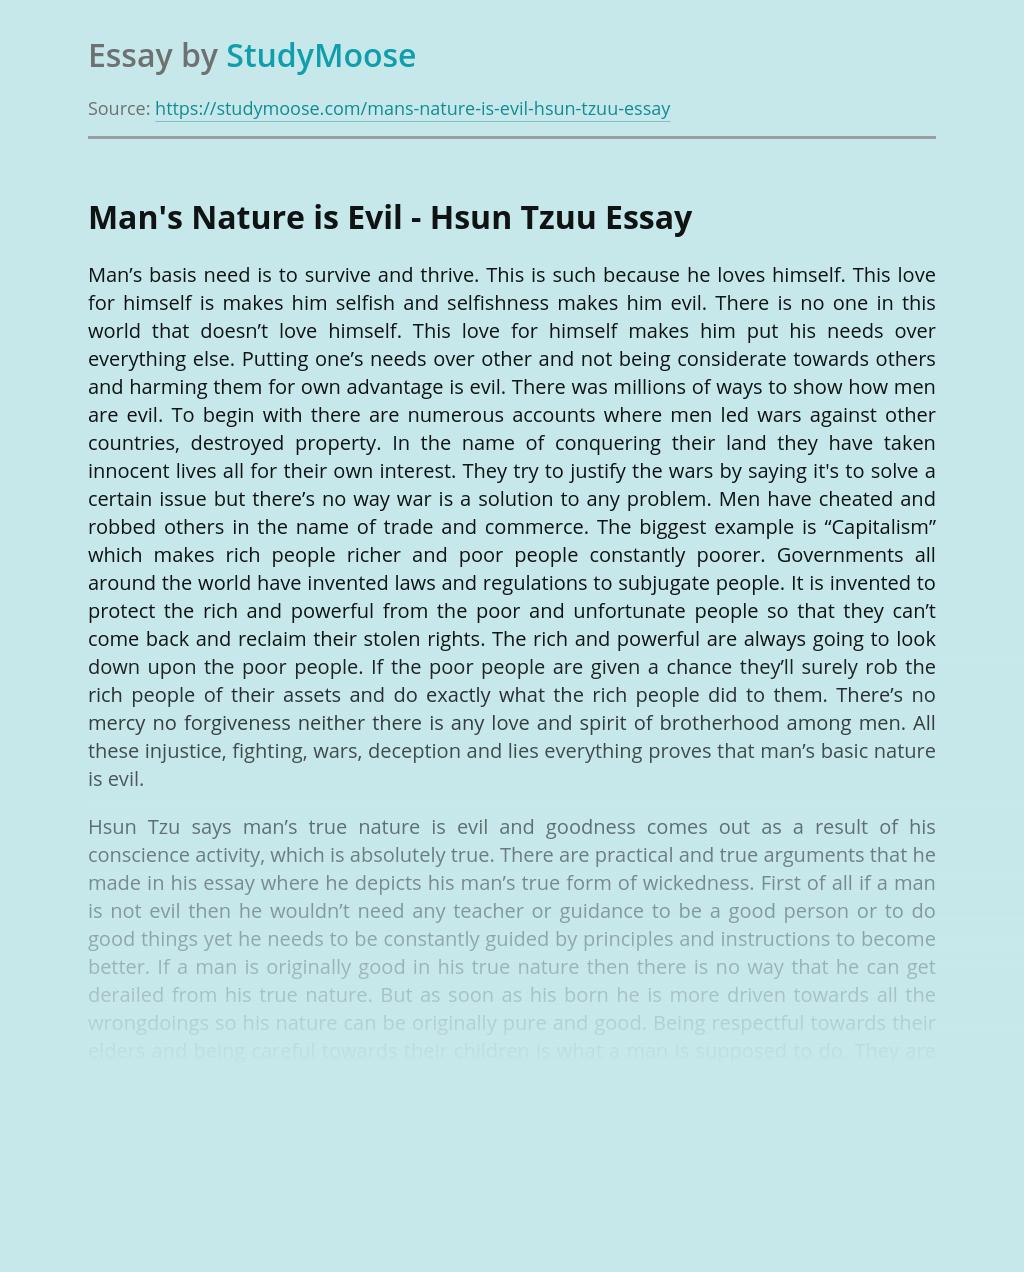 Man's Nature is Evil - Hsun Tzuu